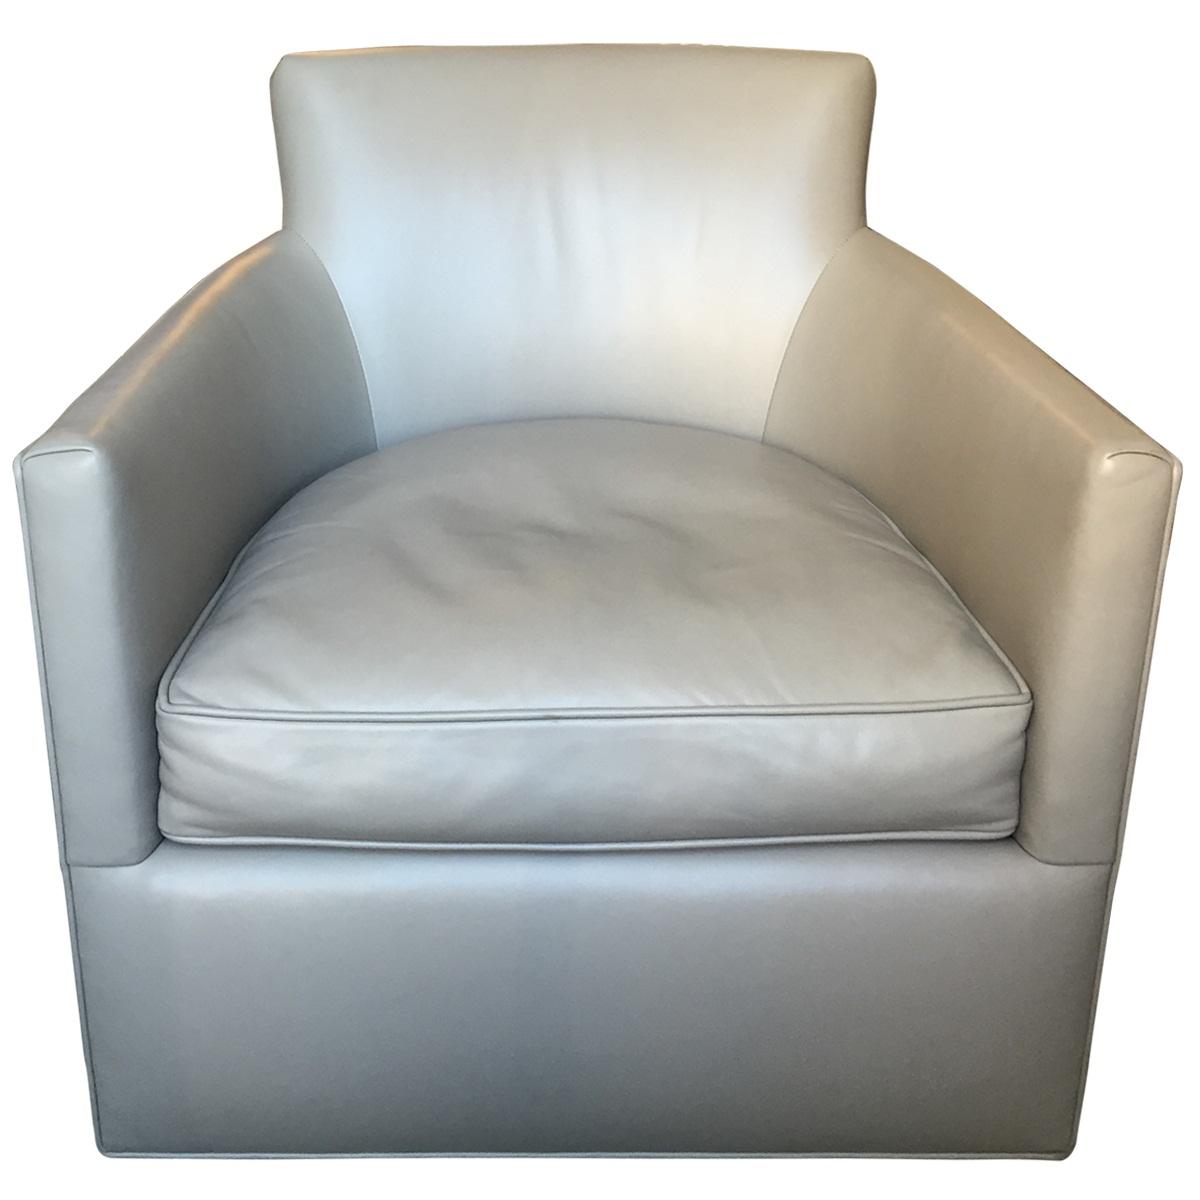 a rudin swivel chairs 16